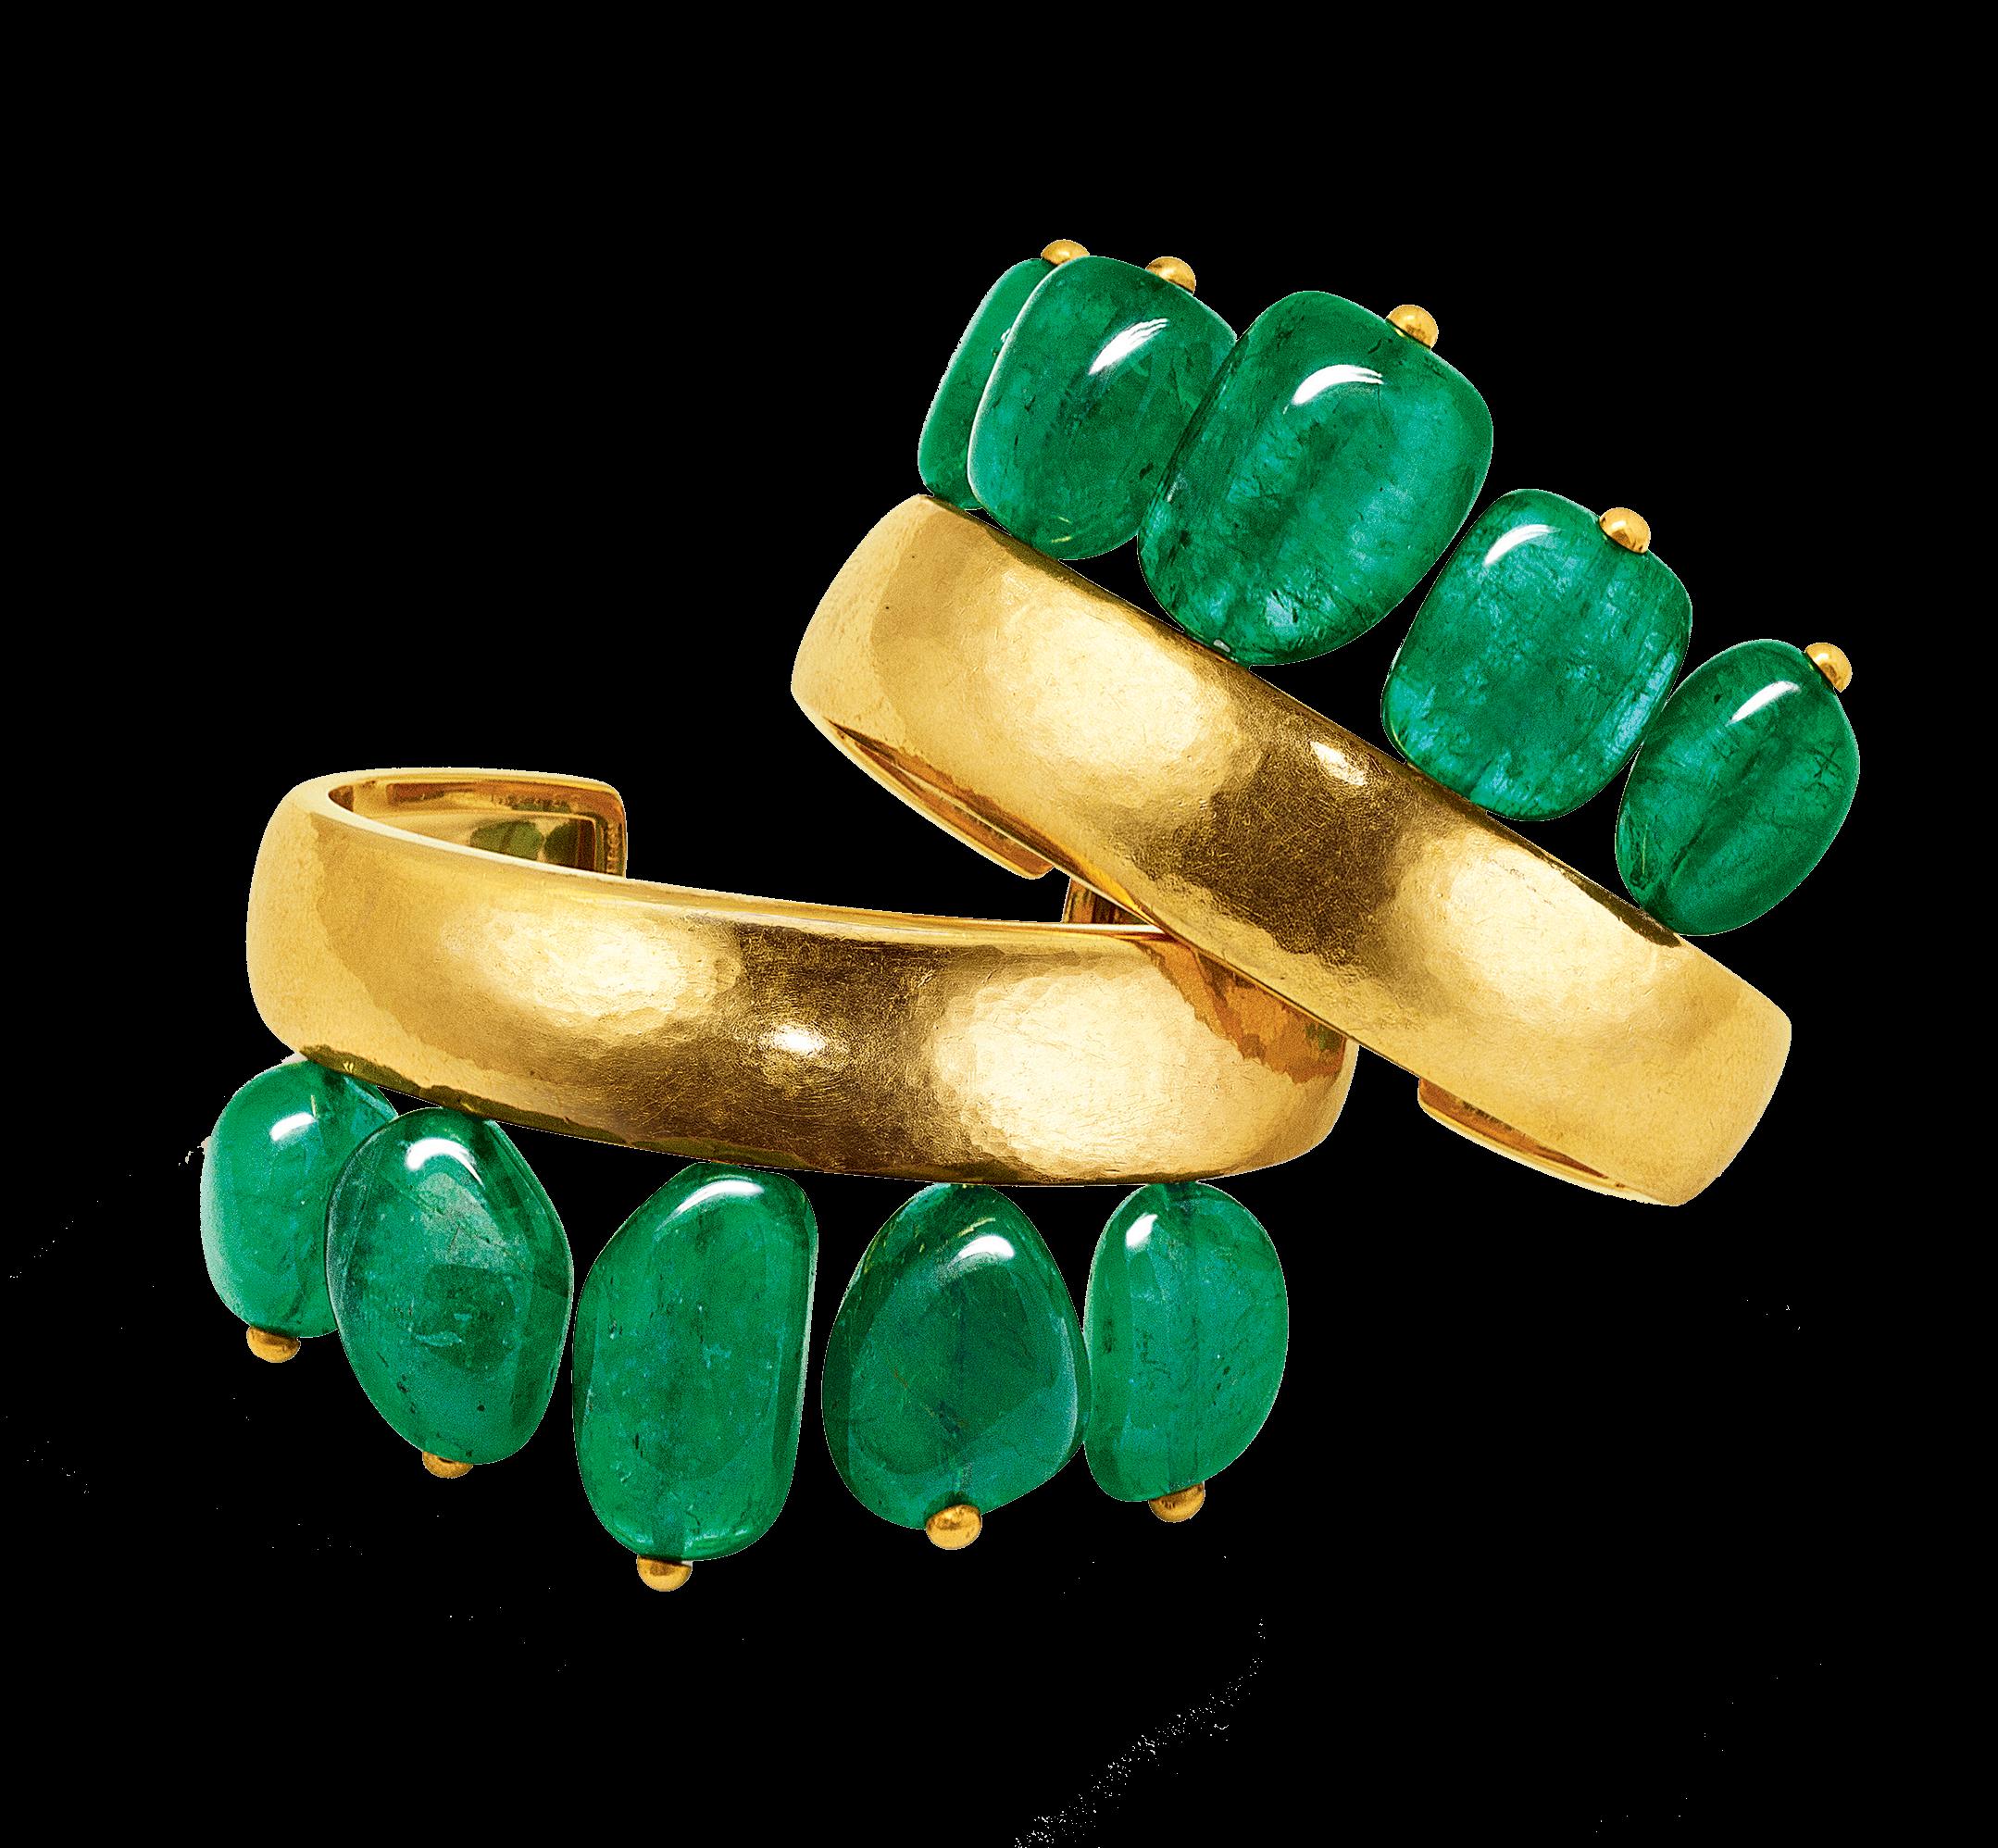 Couronne-Cuffs_Emerald-Gold_19_2158x1996_acf_cropped